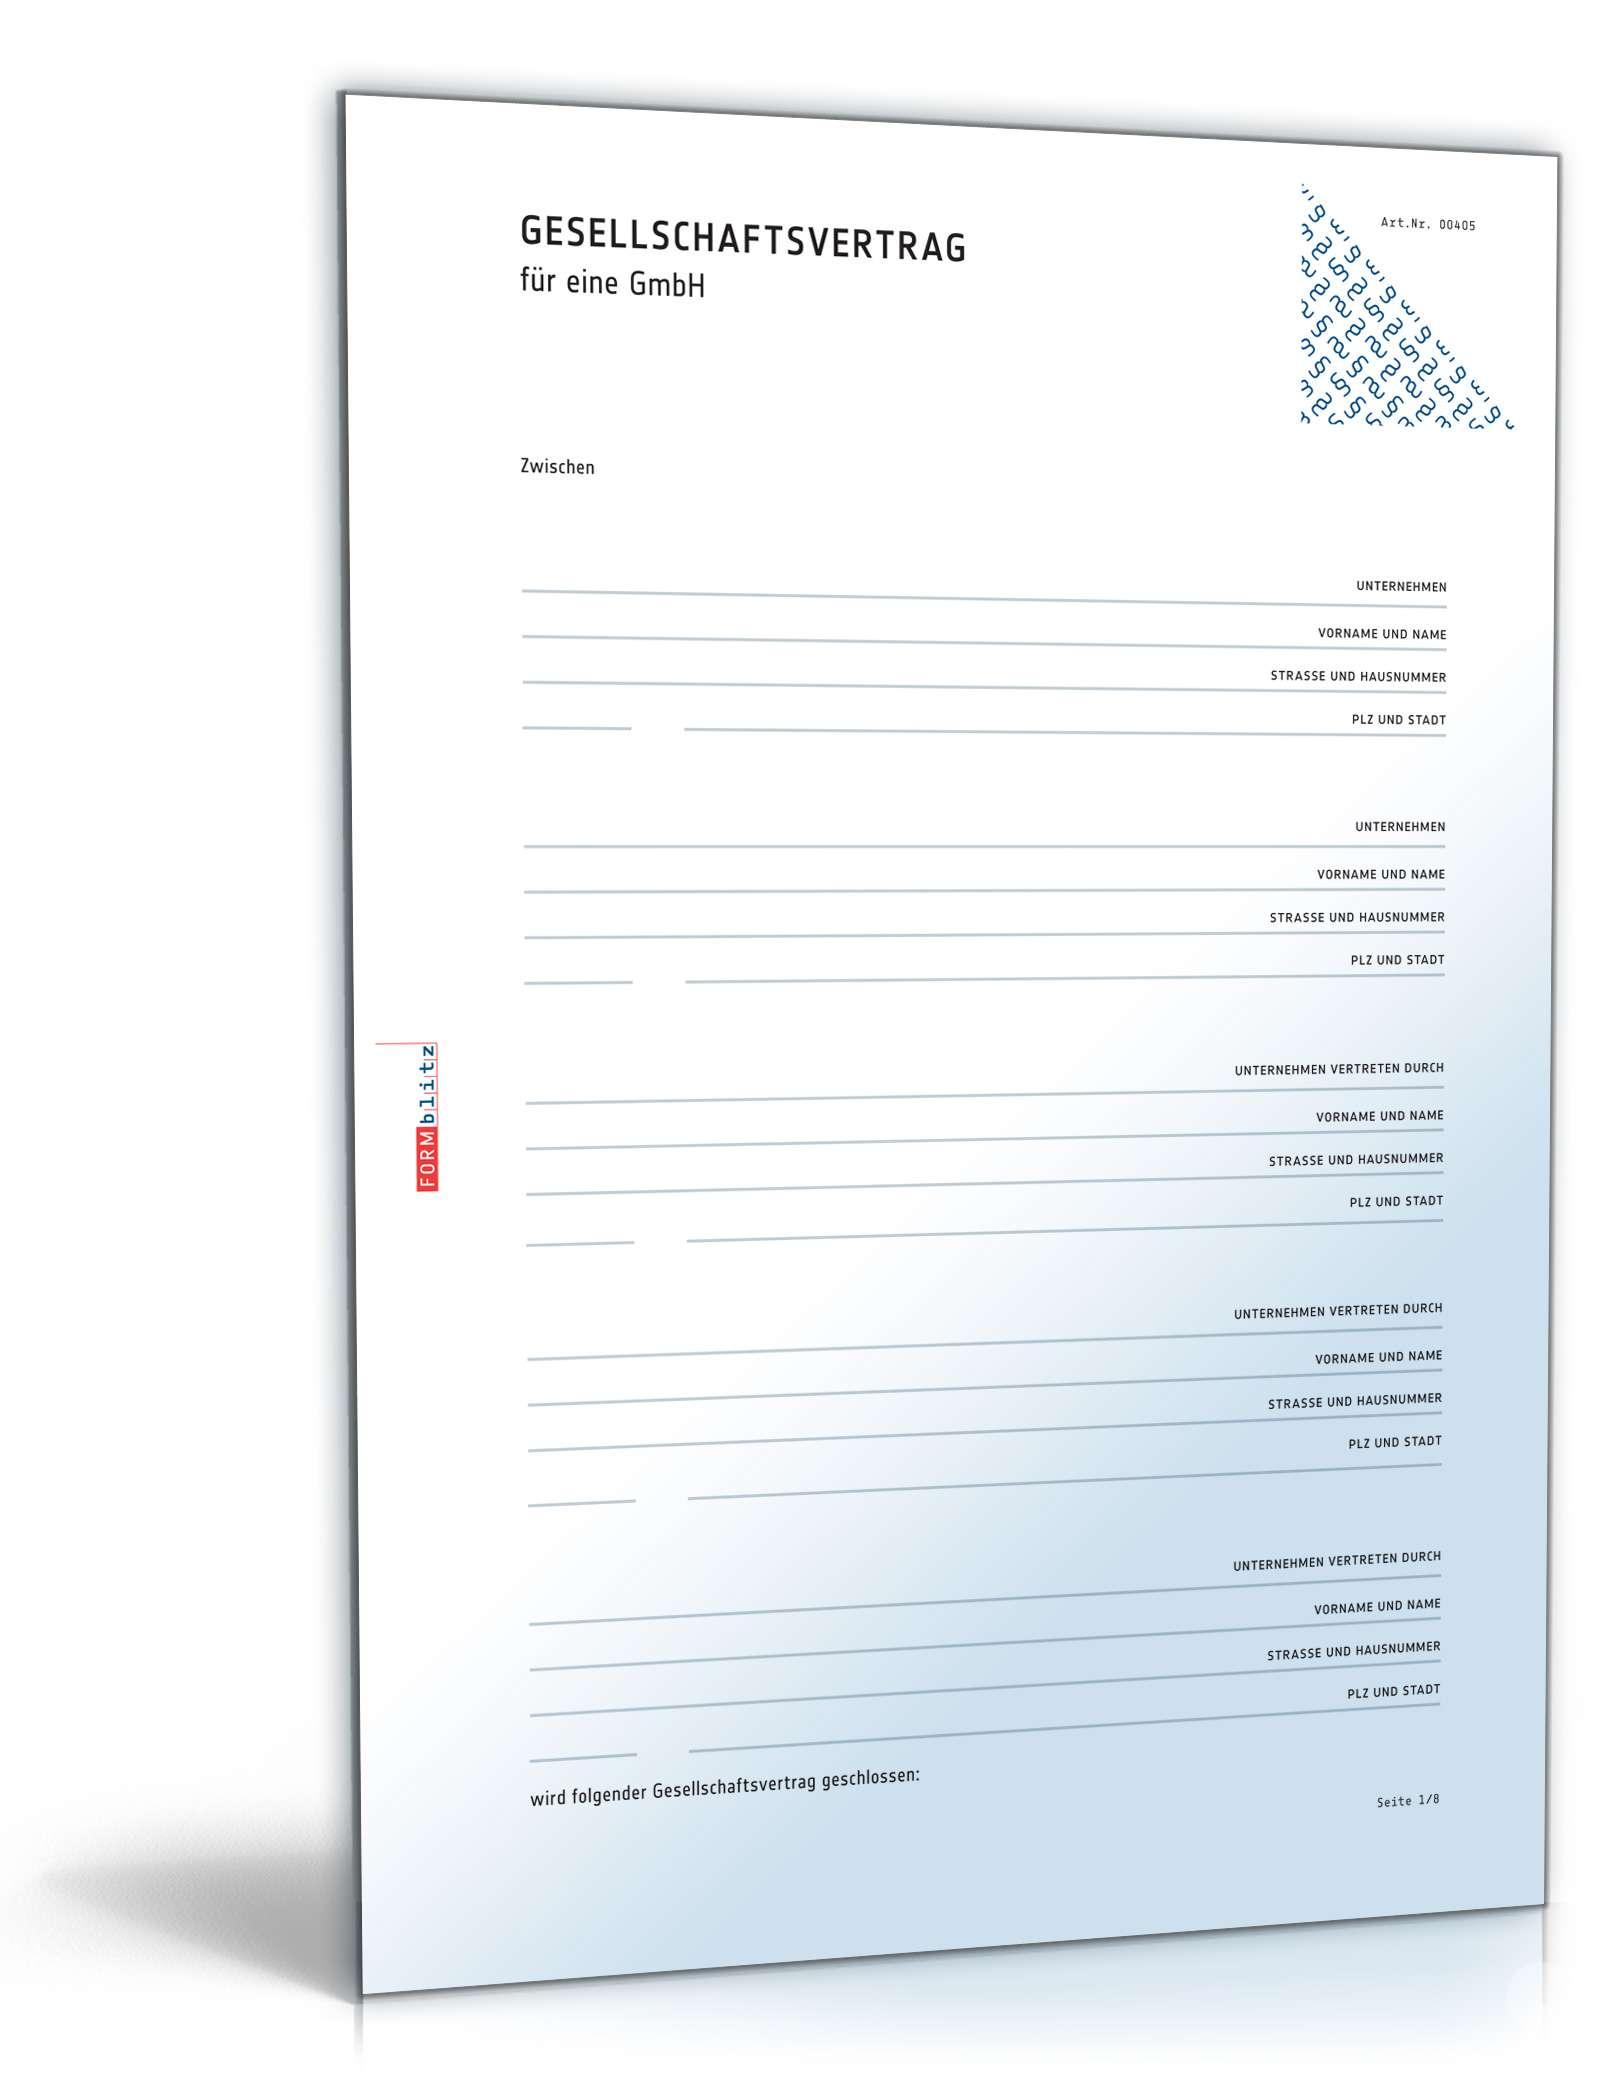 Gmbh Gesellschaftsvertrag Rechtssicheres Muster Zum Download